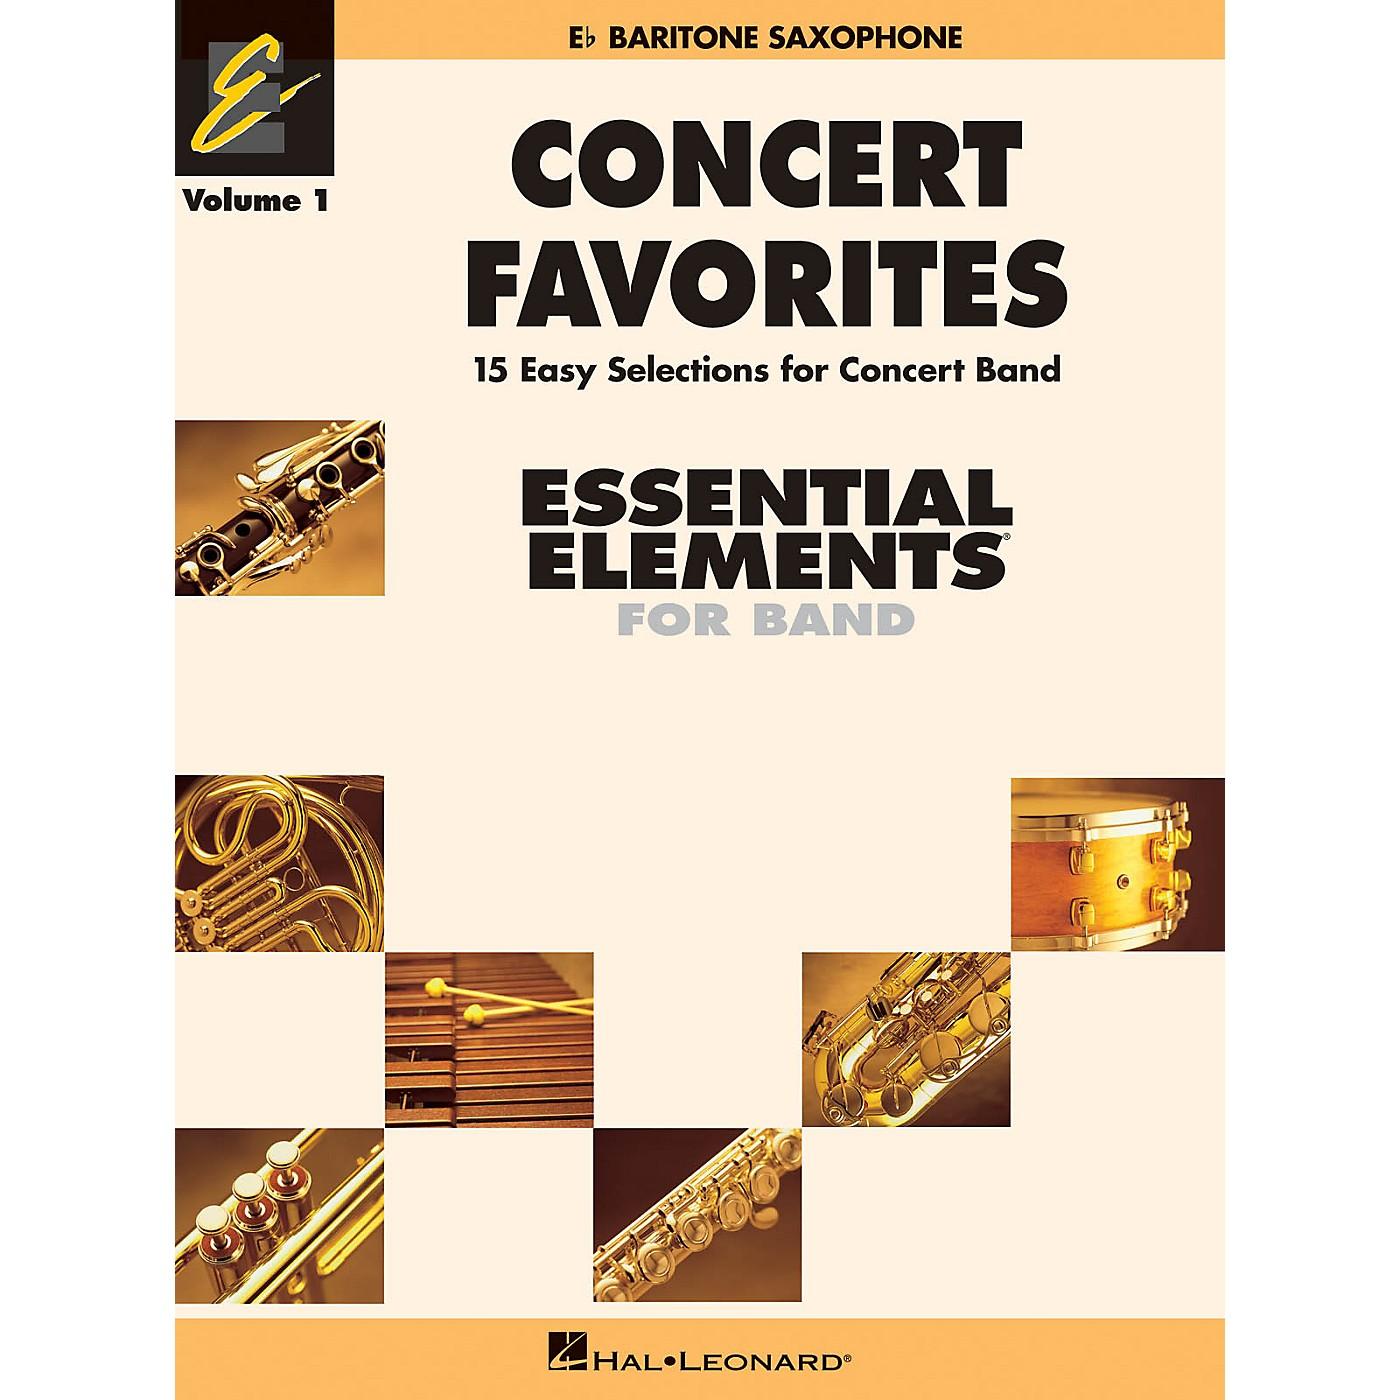 Hal Leonard Concert Favorites Vol. 1 - Eb Baritone Sax Concert Band Level 1-1.5 Arranged by Michael Sweeney thumbnail